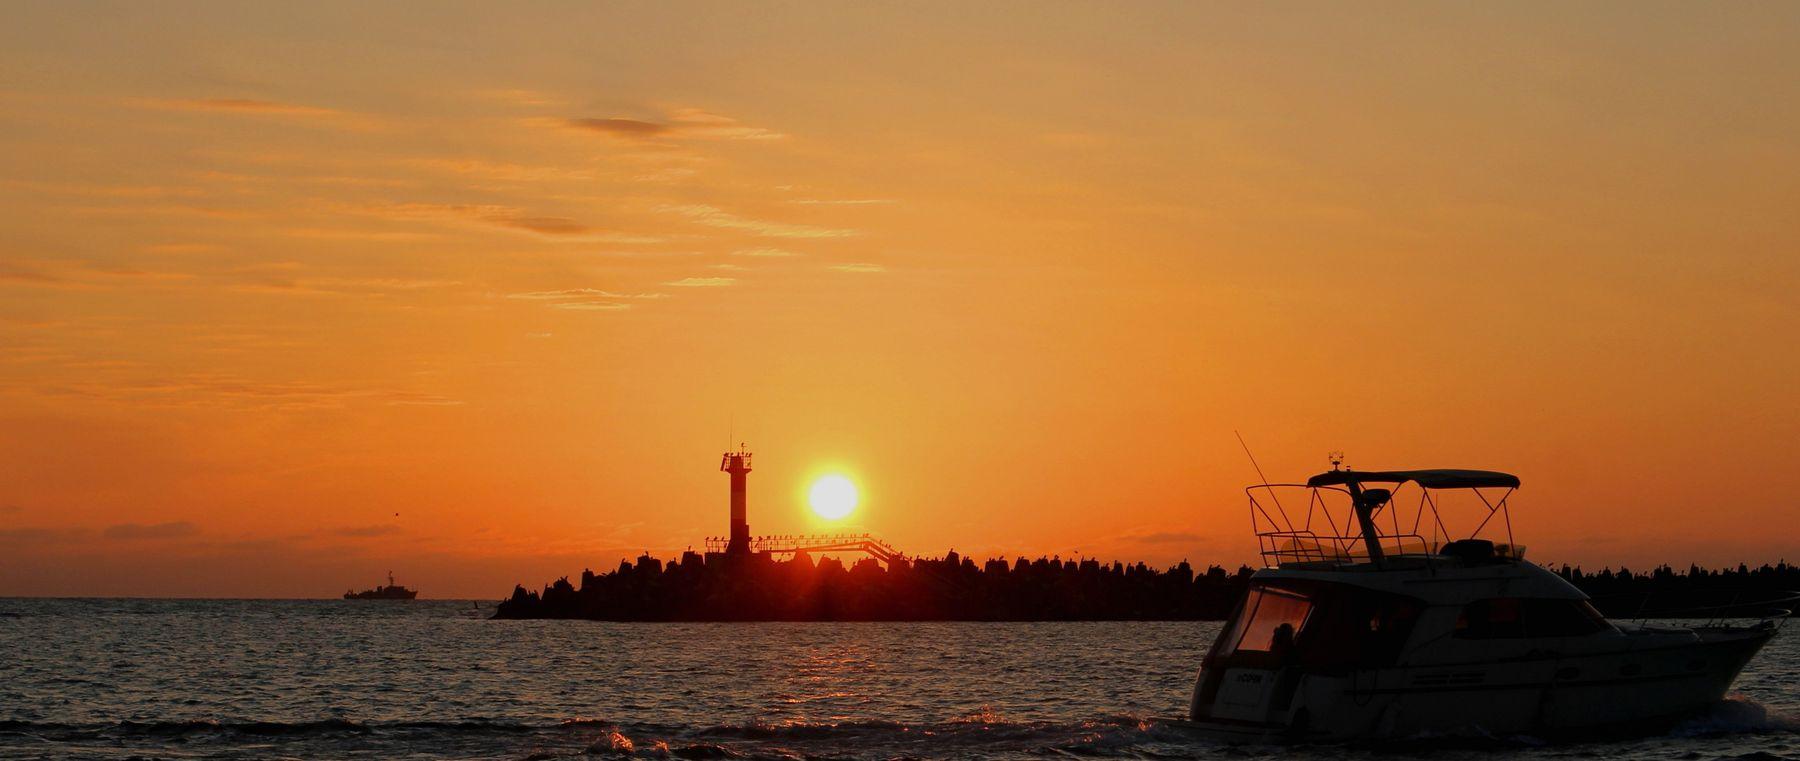 закат над Черным морем закат над Черным морем